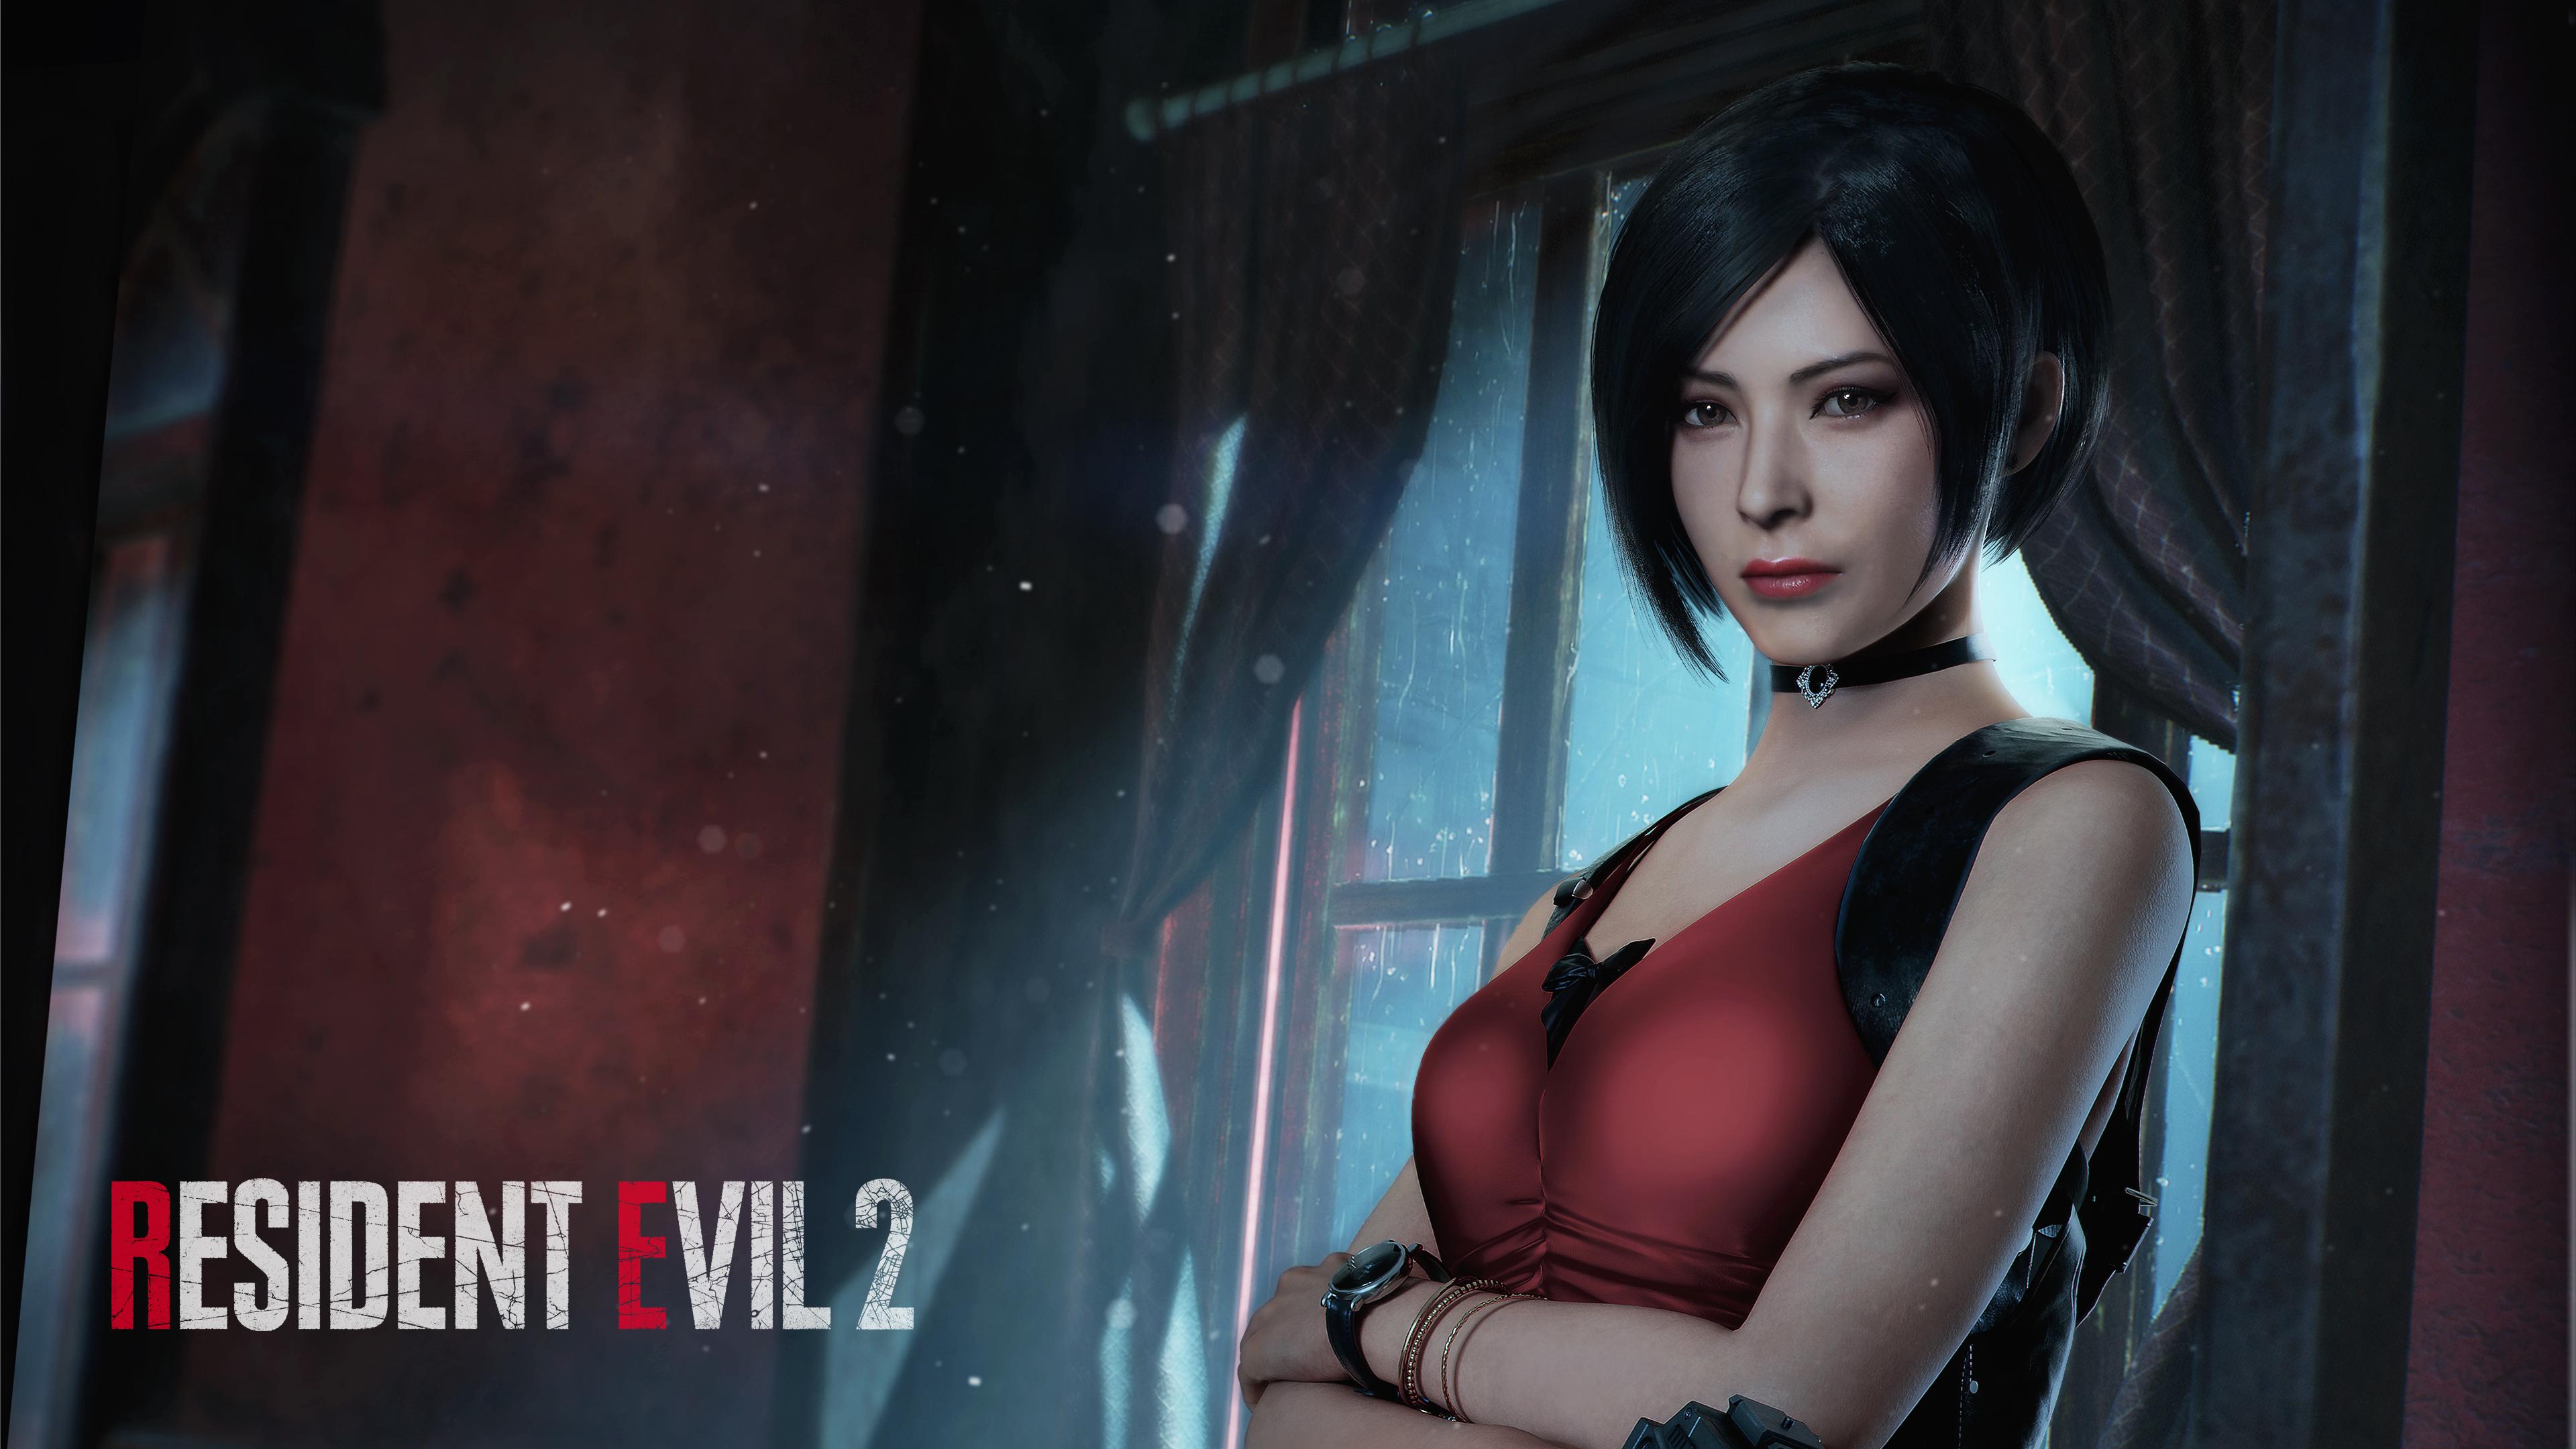 ada wong resident evil 2 4k 1550510537 - Ada Wong Resident Evil 2 4k - resident evil 2 wallpapers, hd-wallpapers, games wallpapers, 4k-wallpapers, 2019 games wallpapers